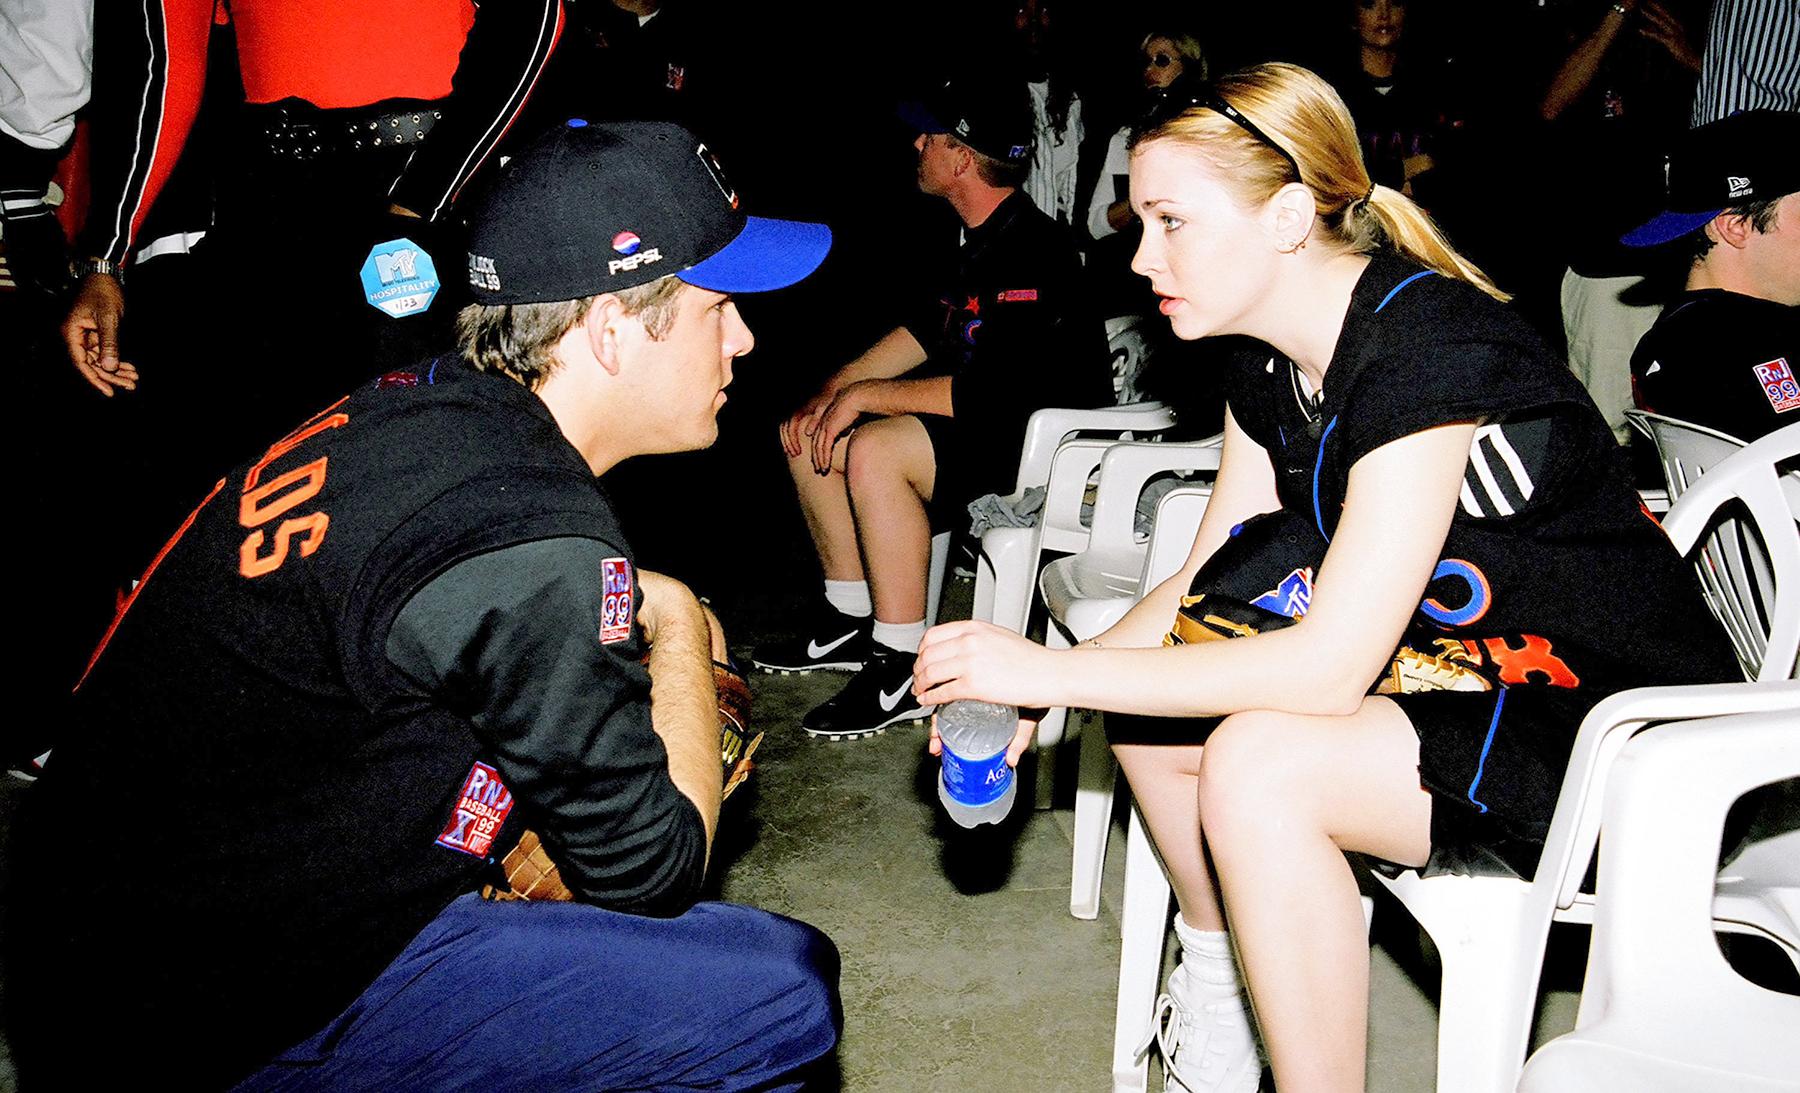 Ryan Reynolds and Melissa Joan Hart during MTV's 10th Annual Rock 'n Jock Baseball Game in Los Angeles, California, in 1999.